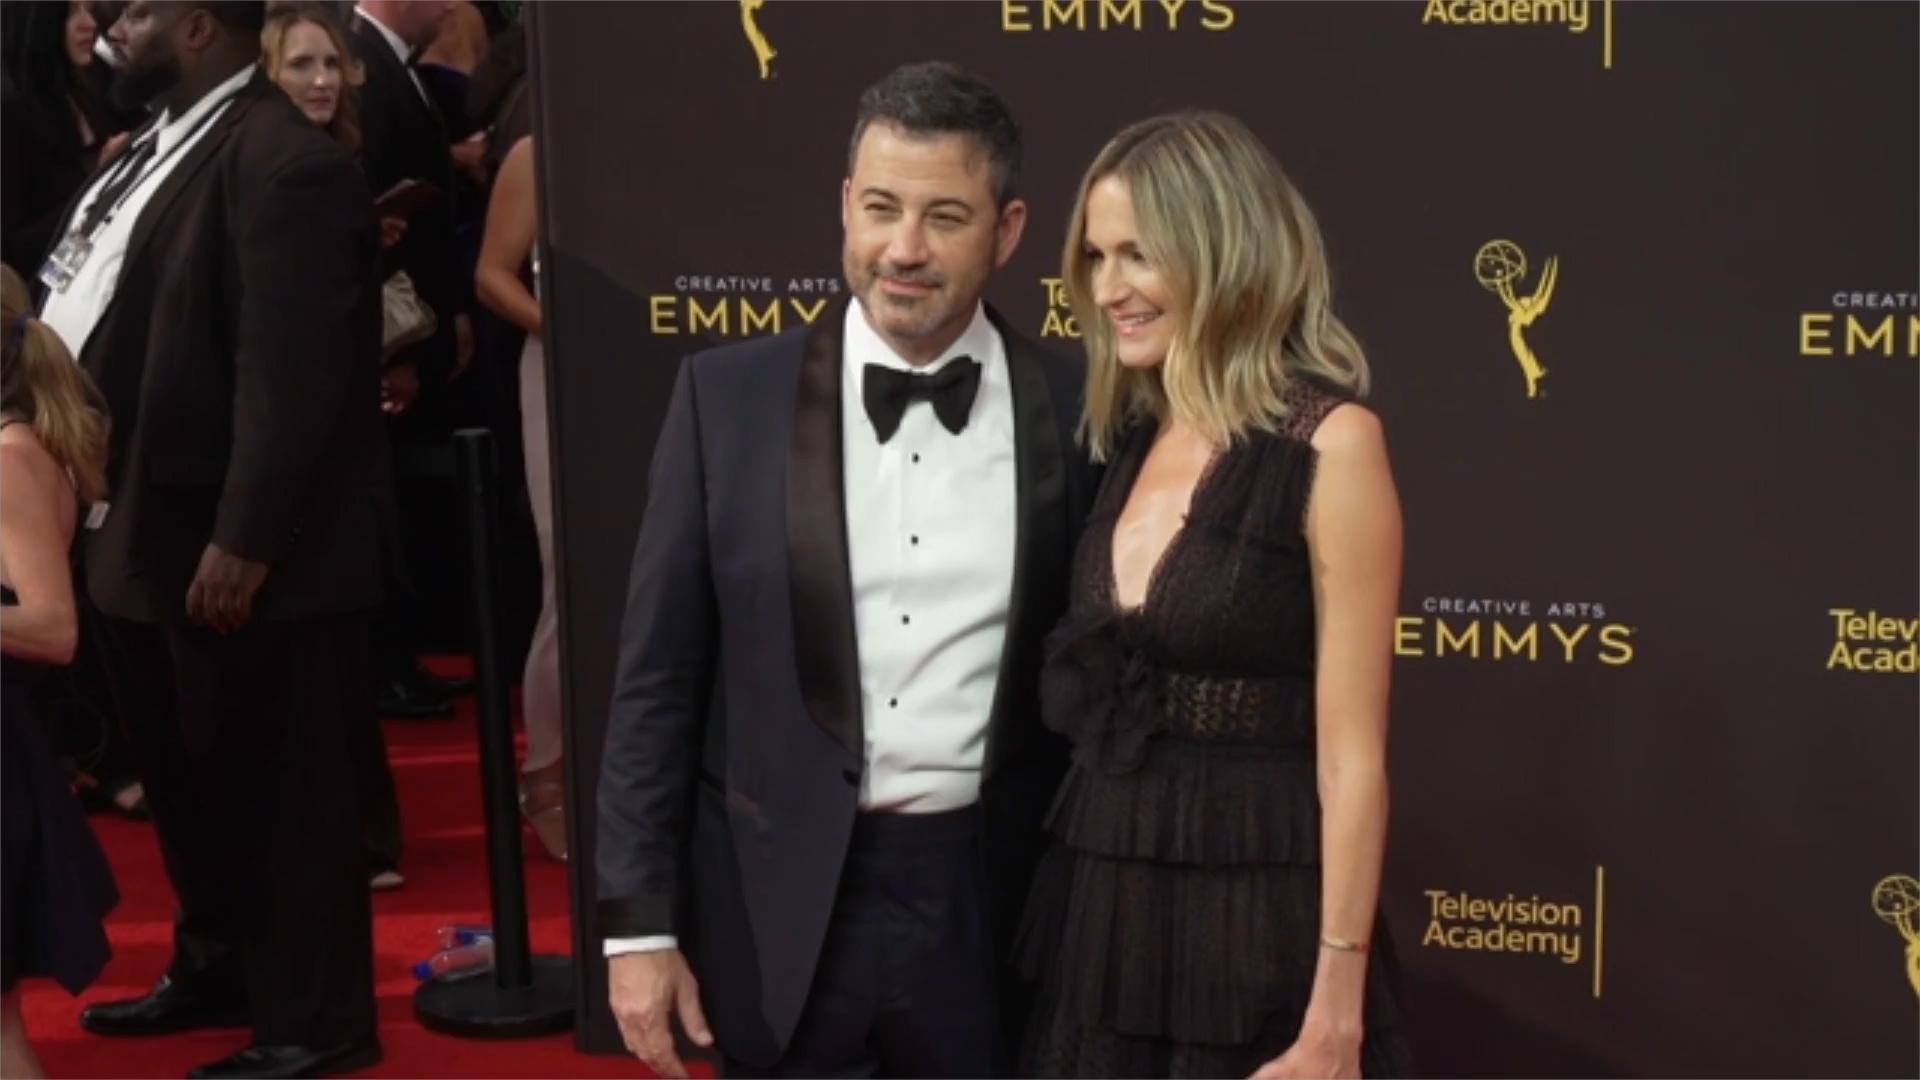 Sean Hannity Dares Jimmy Kimmel To Renew Feud In Bizarre 'I Will Unload' Rant